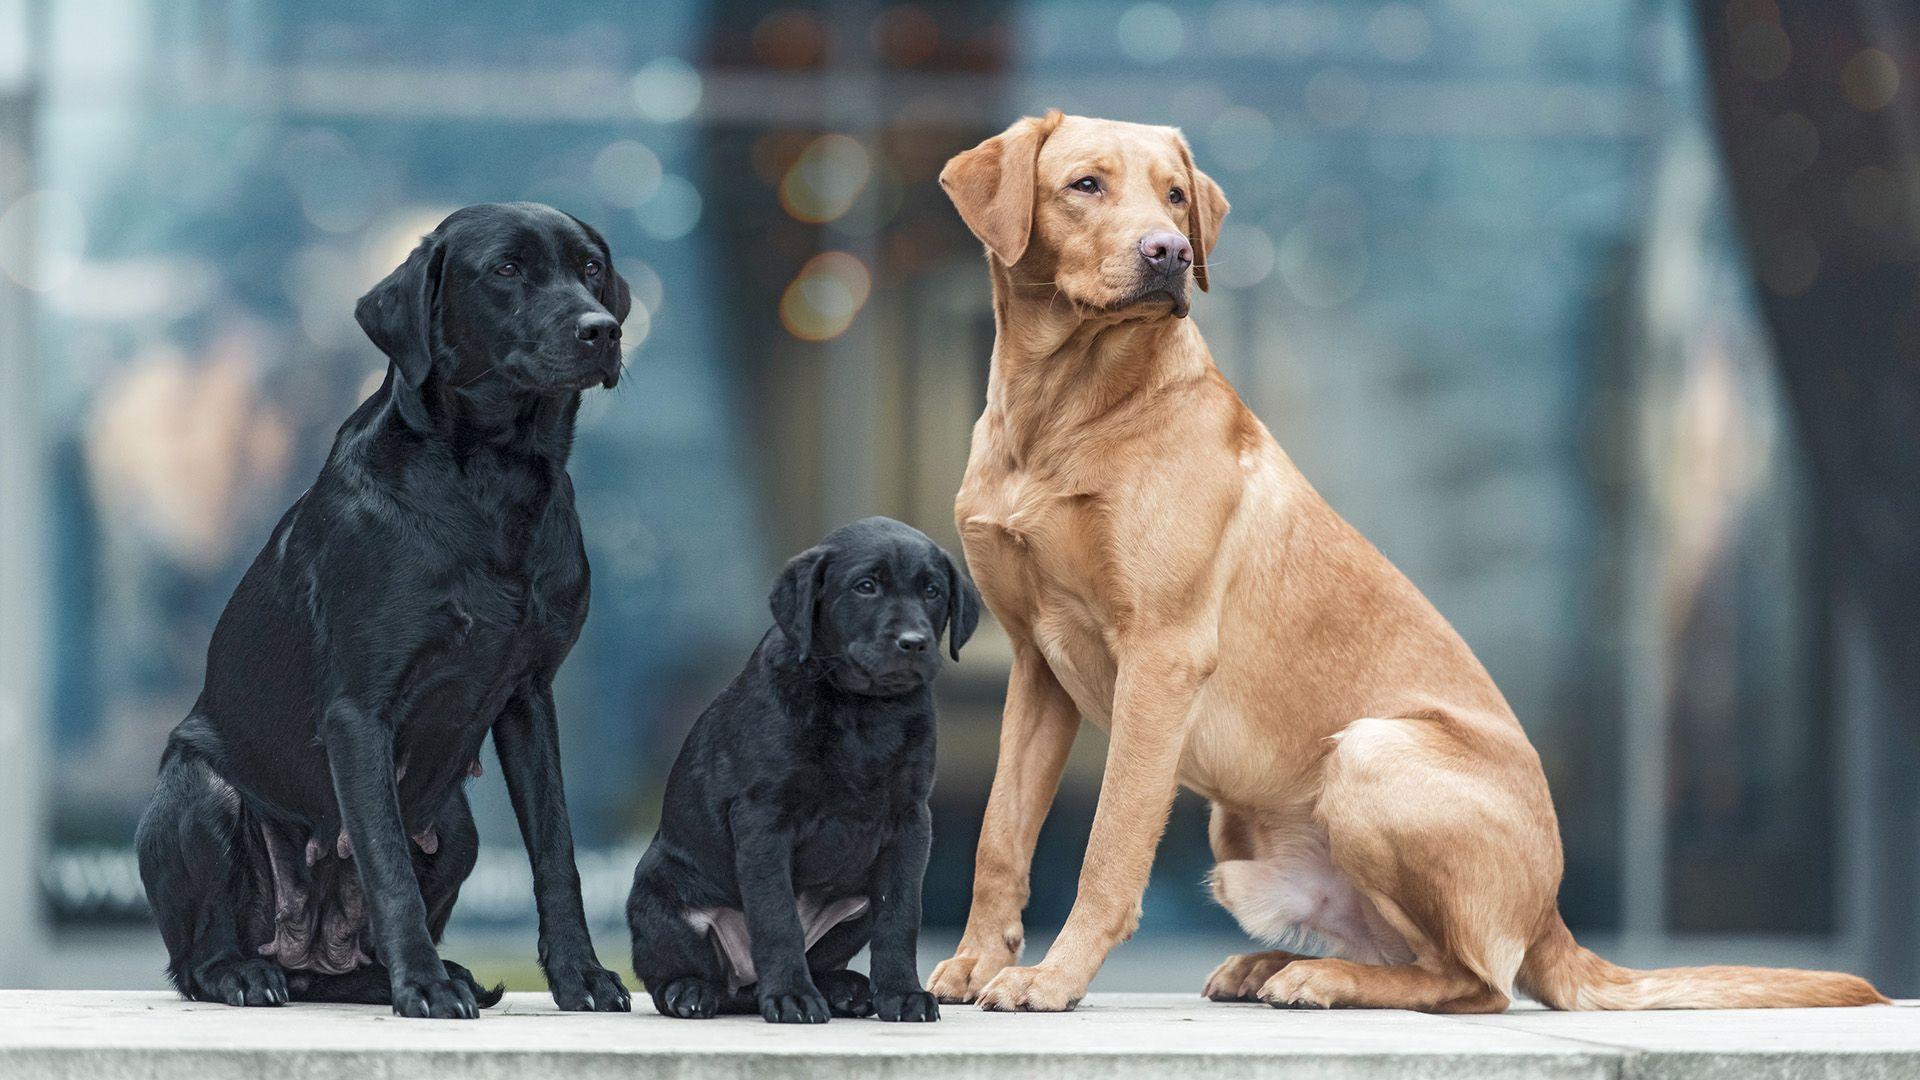 Adorable Labrador Retriever Goldador In 2020 Labrador Retriever Labrador Retriever